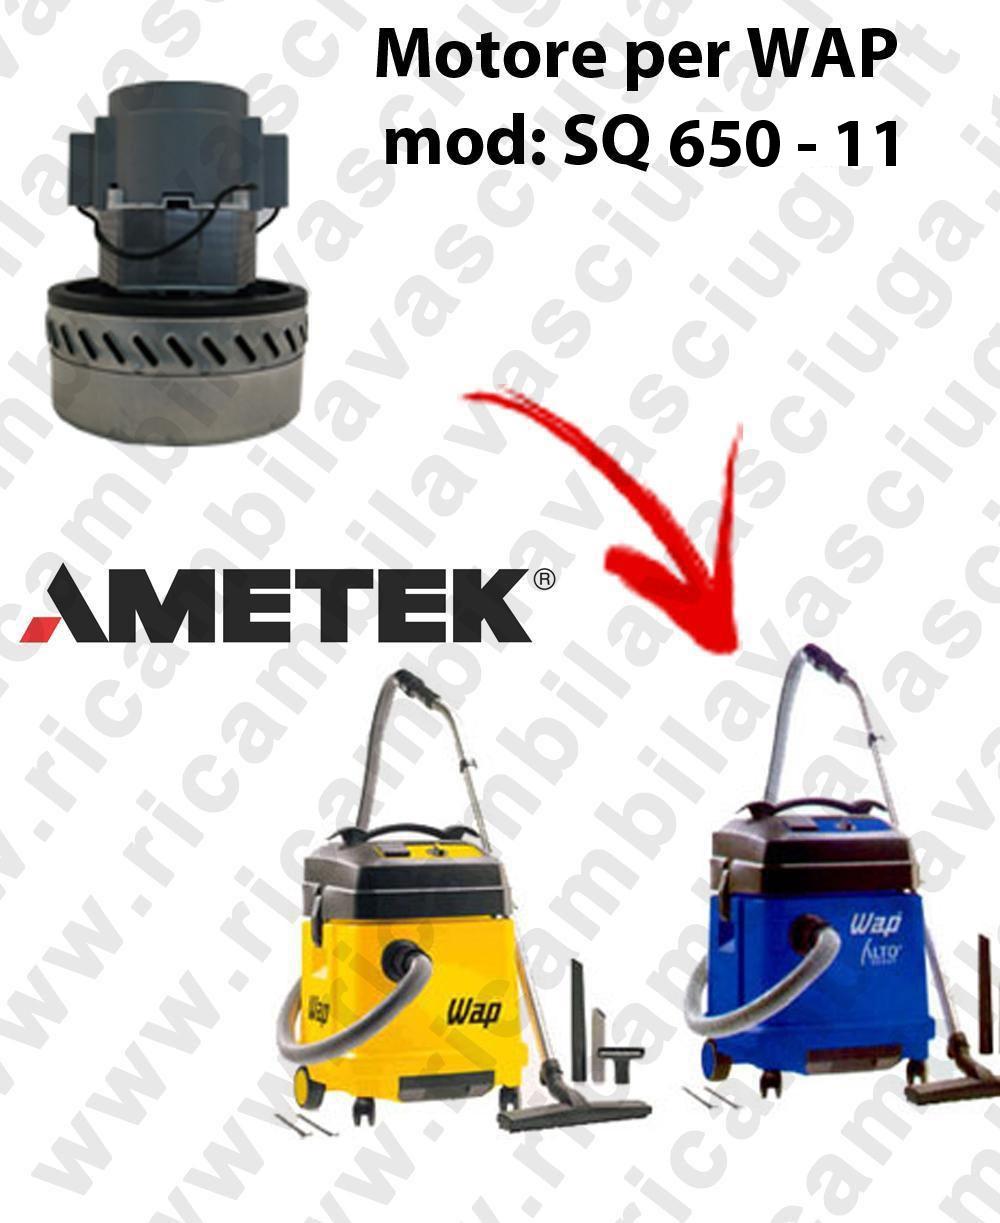 SQ 650 - 11 Motore de aspiración AMETEK  para aspiradora WAP